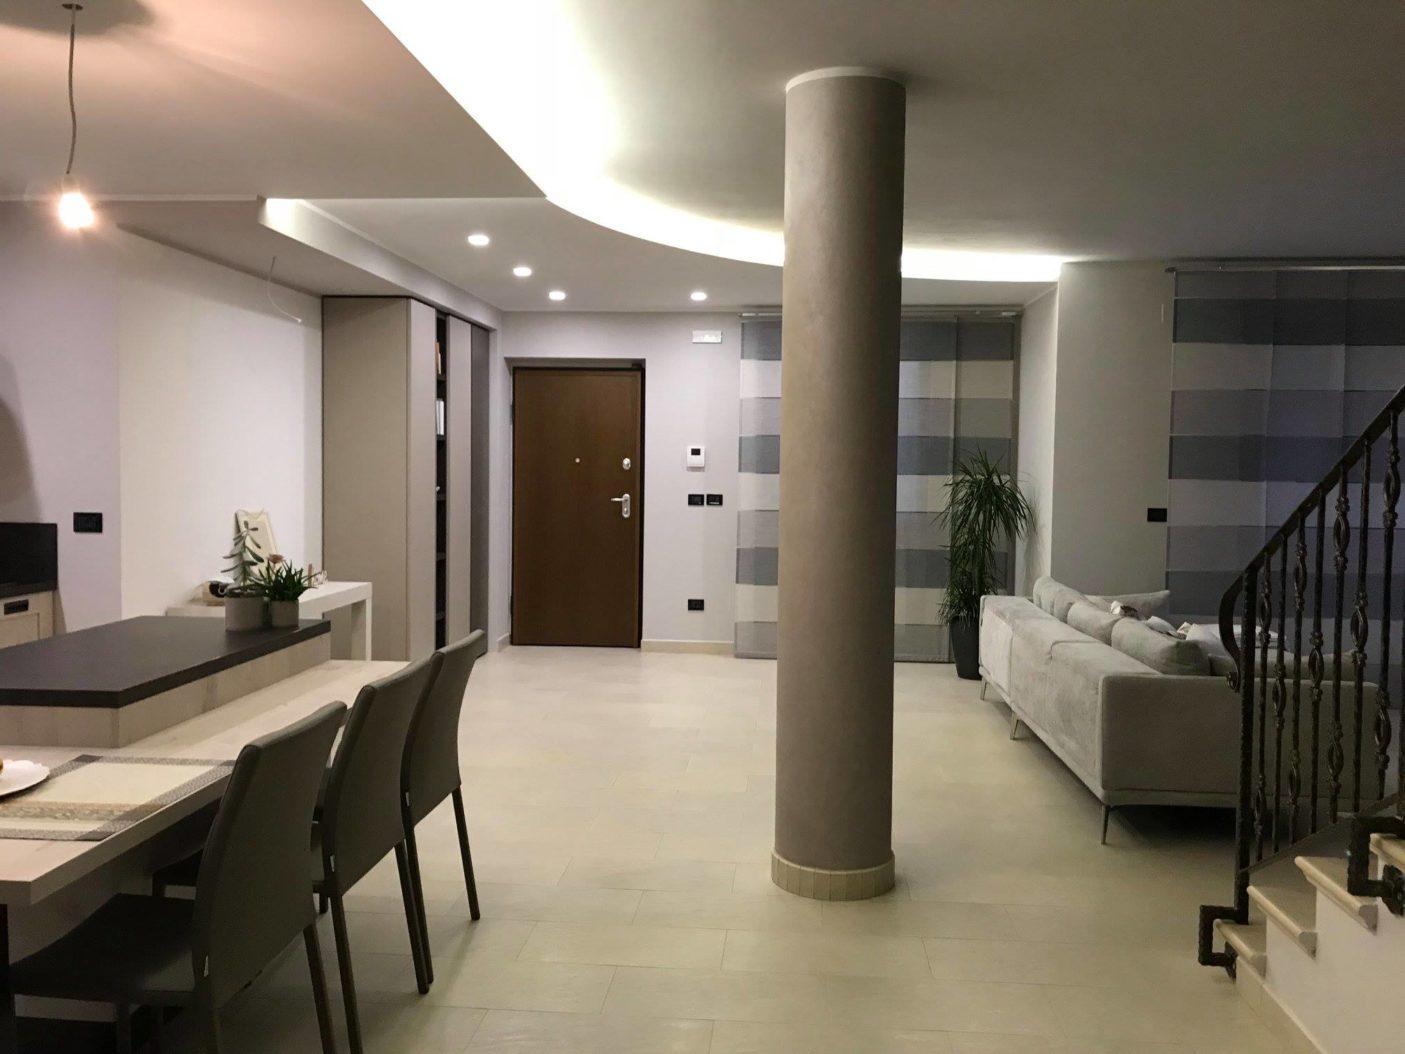 Zona-living-Doimo-salotto-camera-da-letto-Novamobili7.jpg